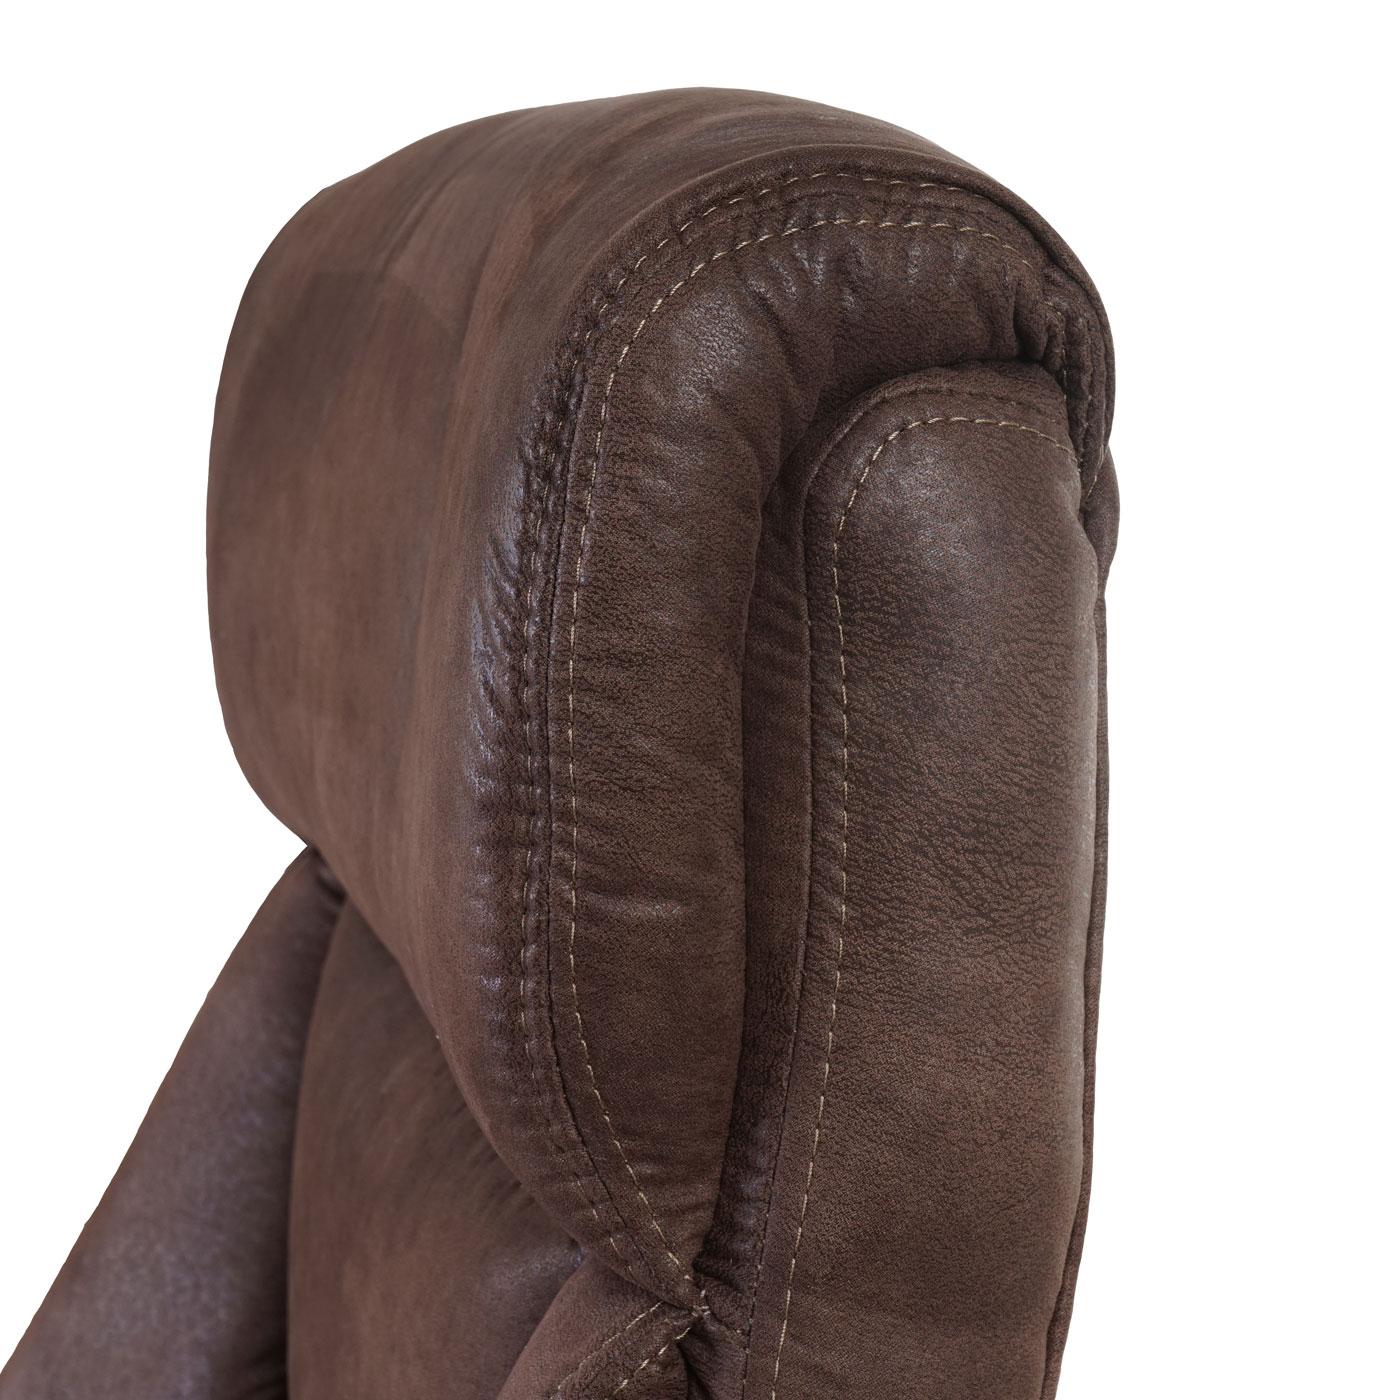 Bürostuhl Dallas Detailansicht Kopfstütze